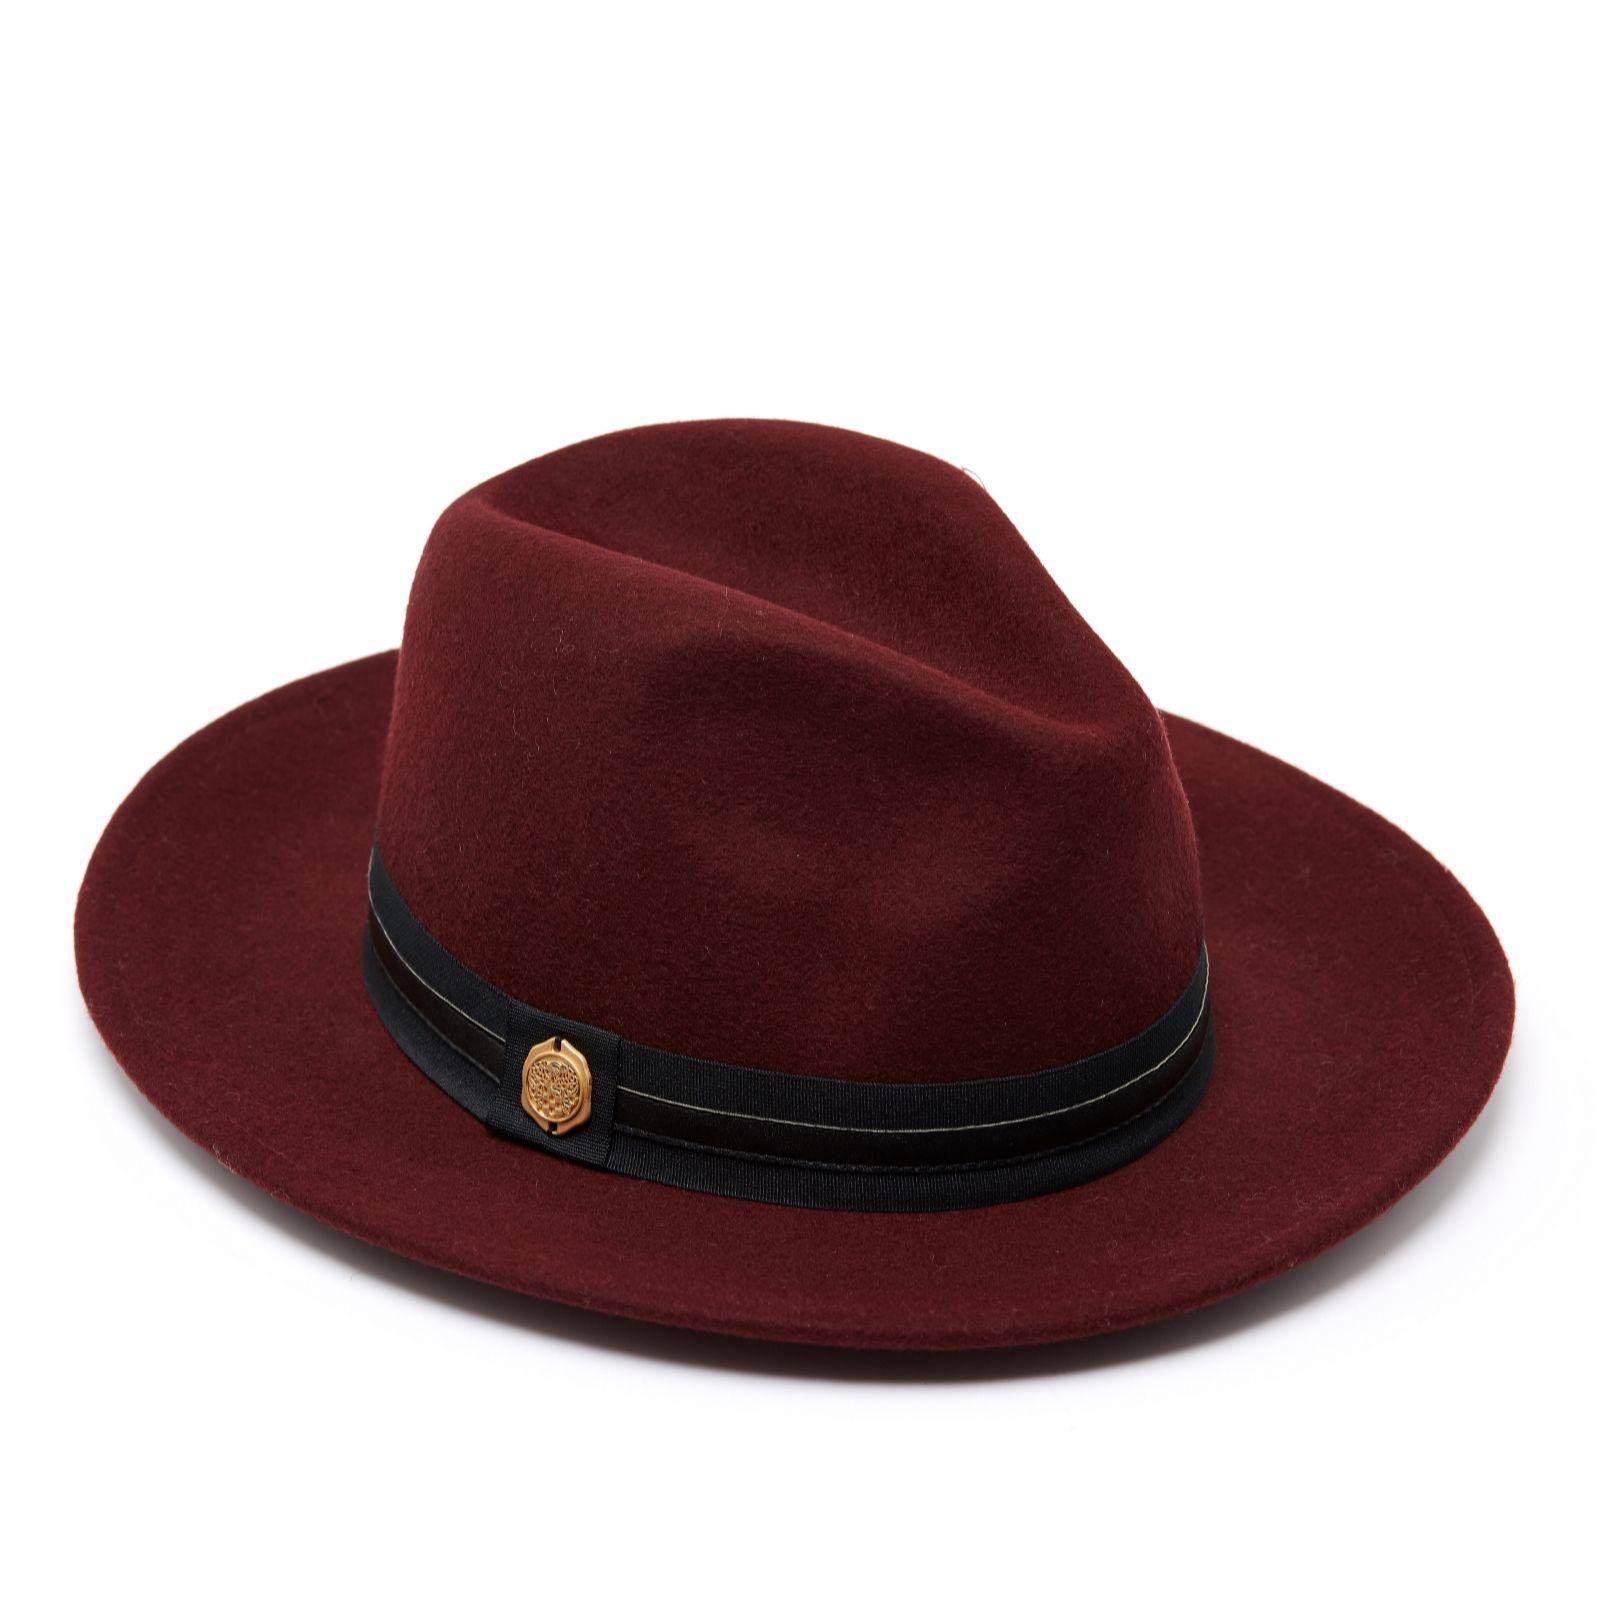 ff0f8ff6a Vince Camuto Banded Panama Hat - QVC UK